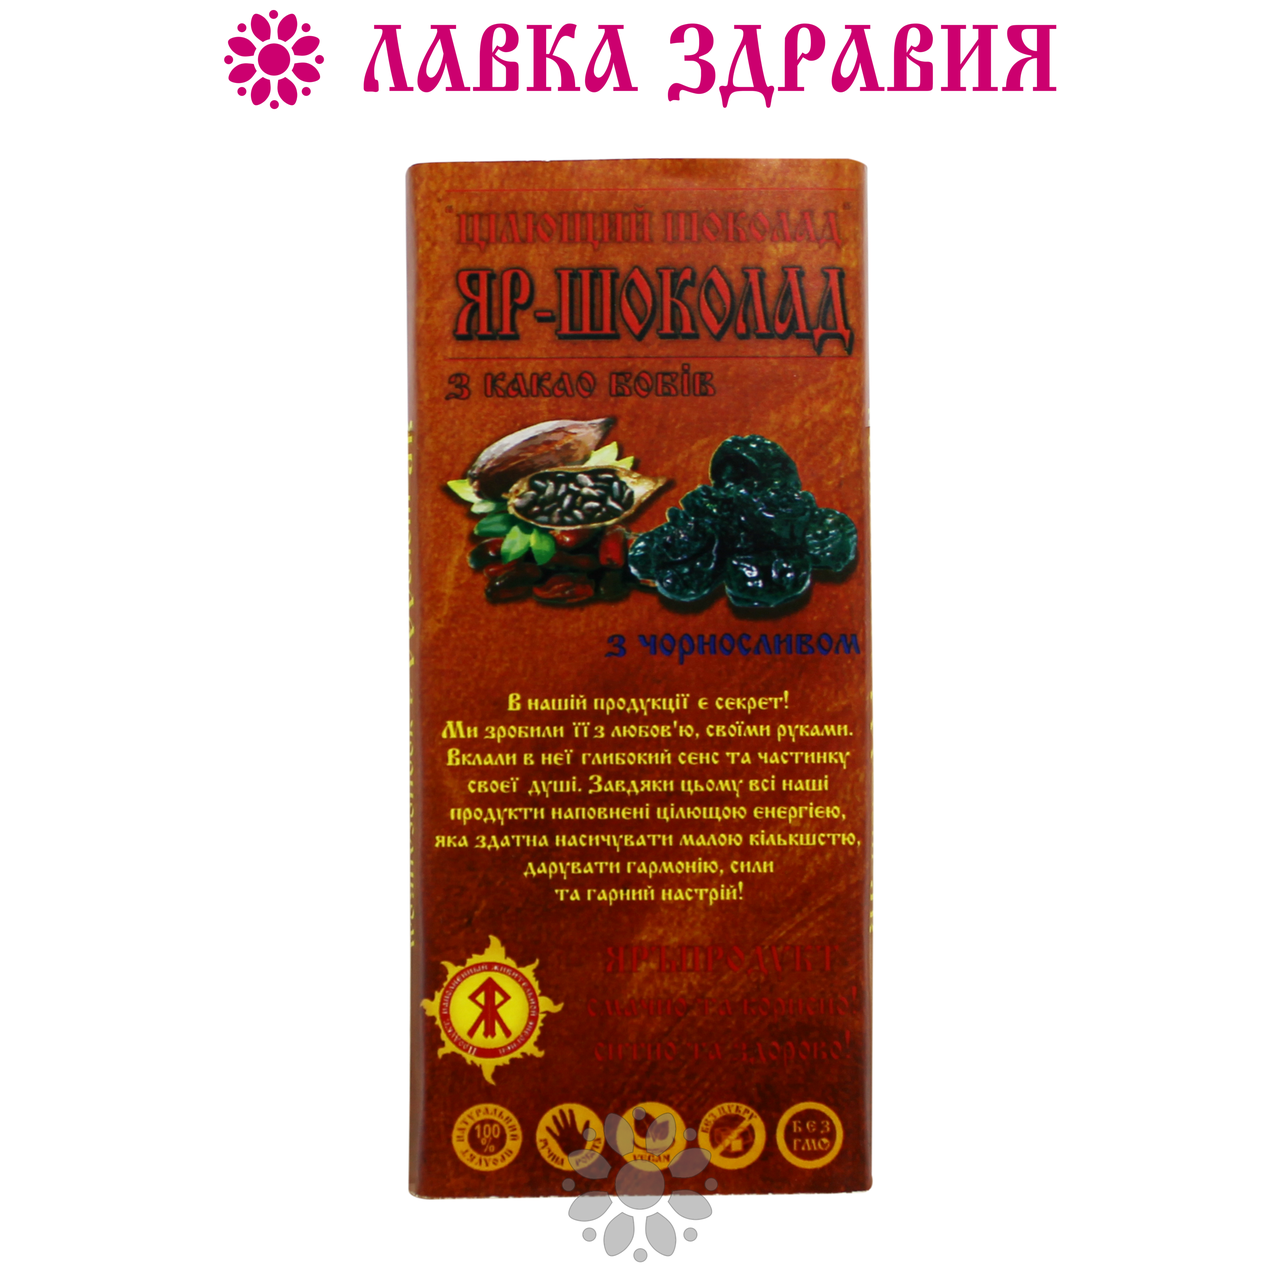 Яръ-шоколад с финиками и черносливом, 100 г